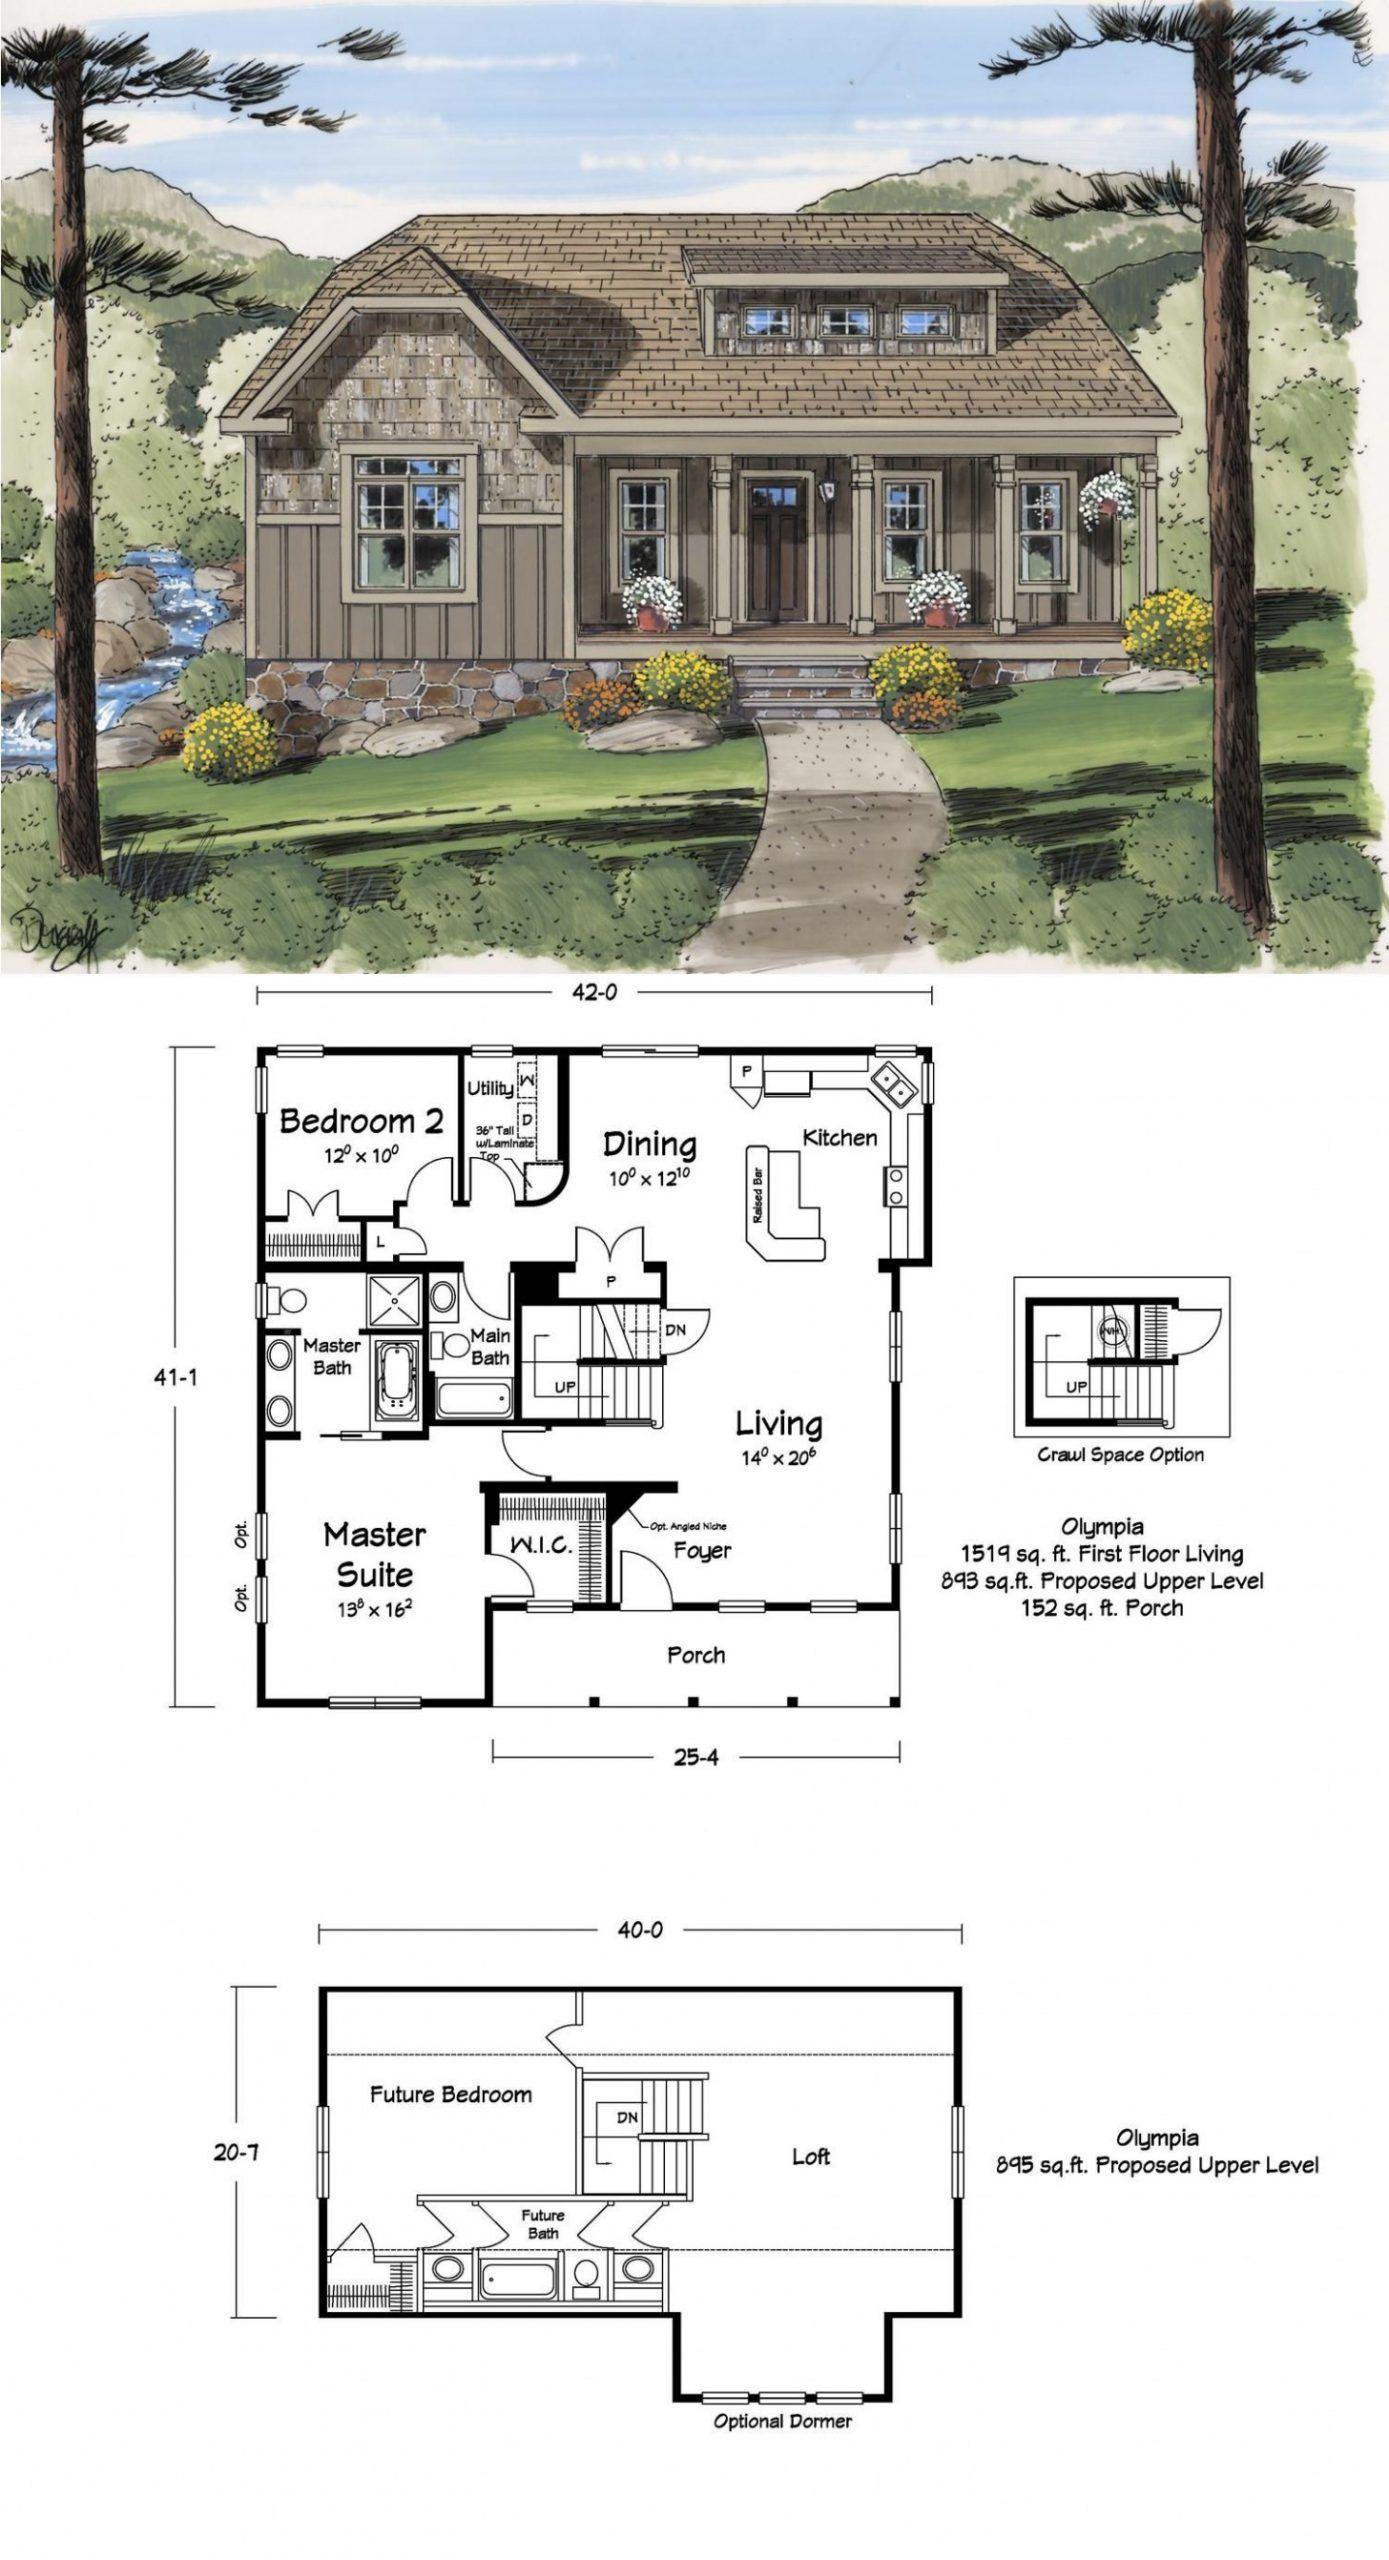 Bedroom Floor Loft Plan Tinyhomesplanstwostory 4 Bedroom Floor Plan With Loft 4 Bedroom Floor Plan With Mountain House Plans Loft Floor Plans House Plans